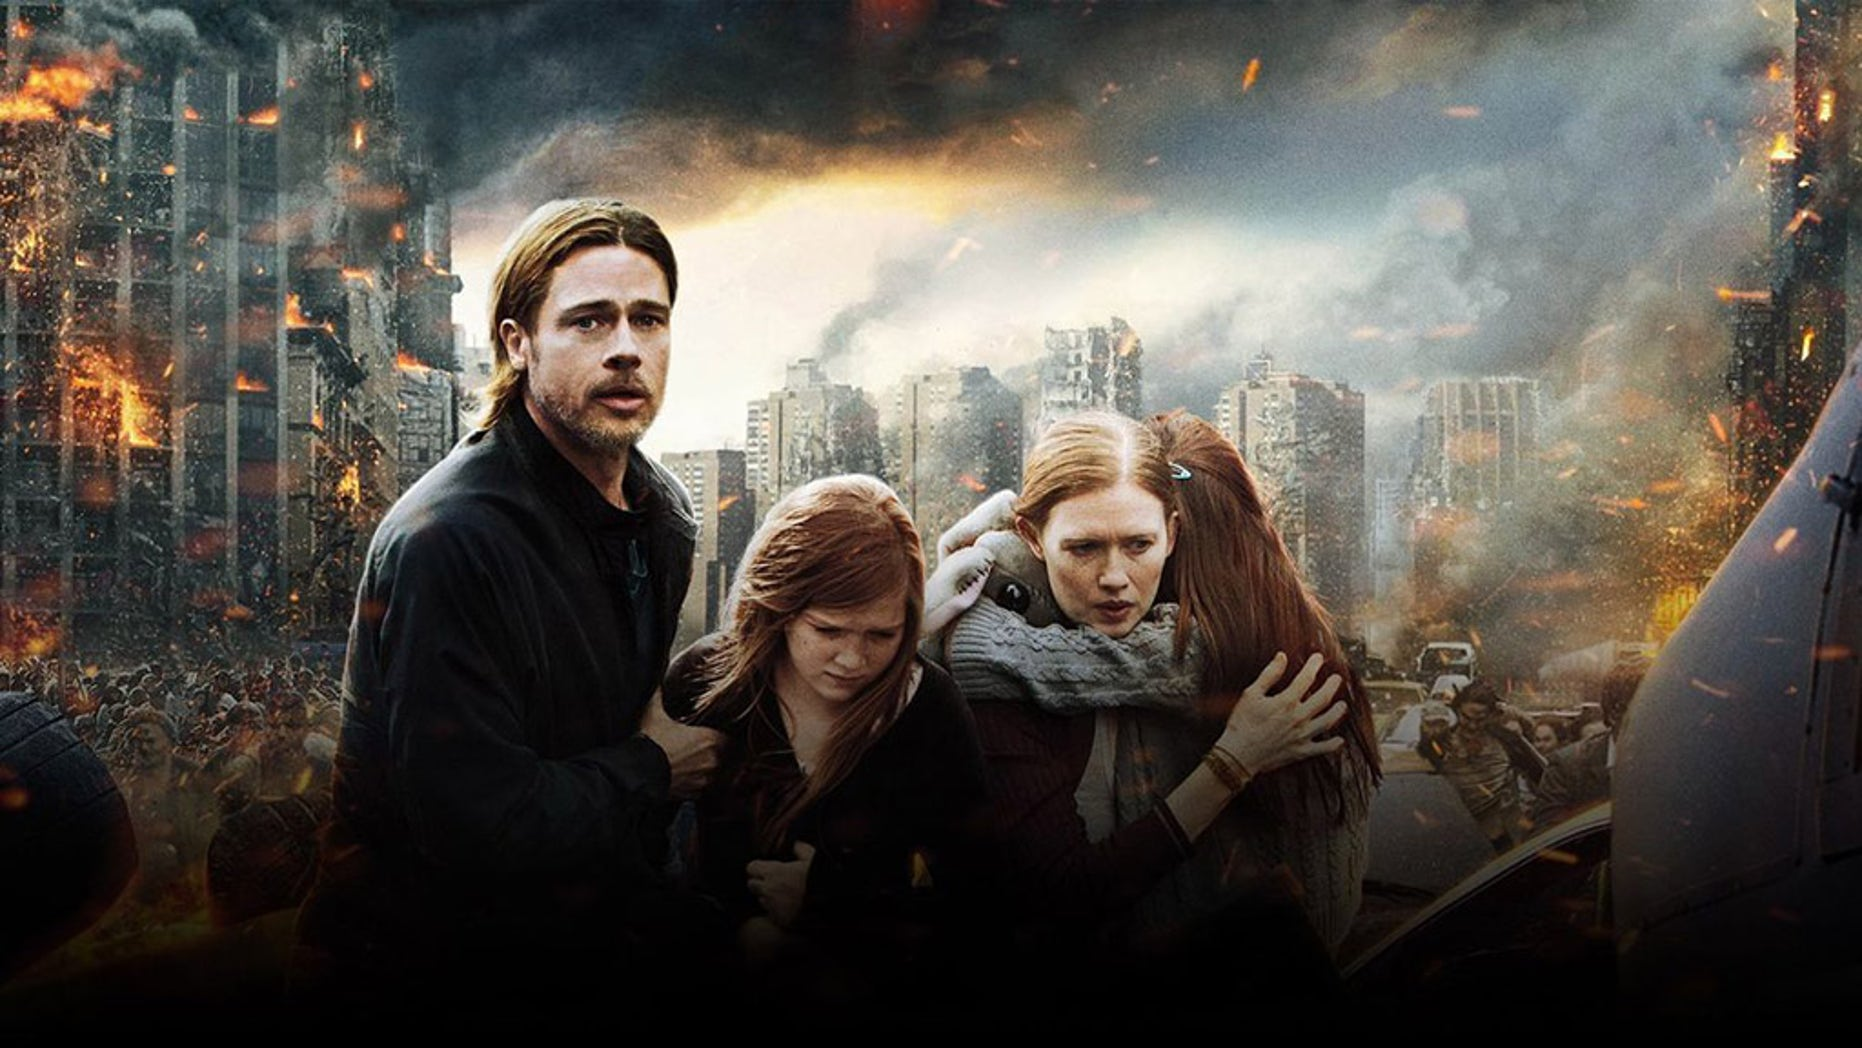 Paramount Pulls The Plug On David Fincher's World War Z Sequel